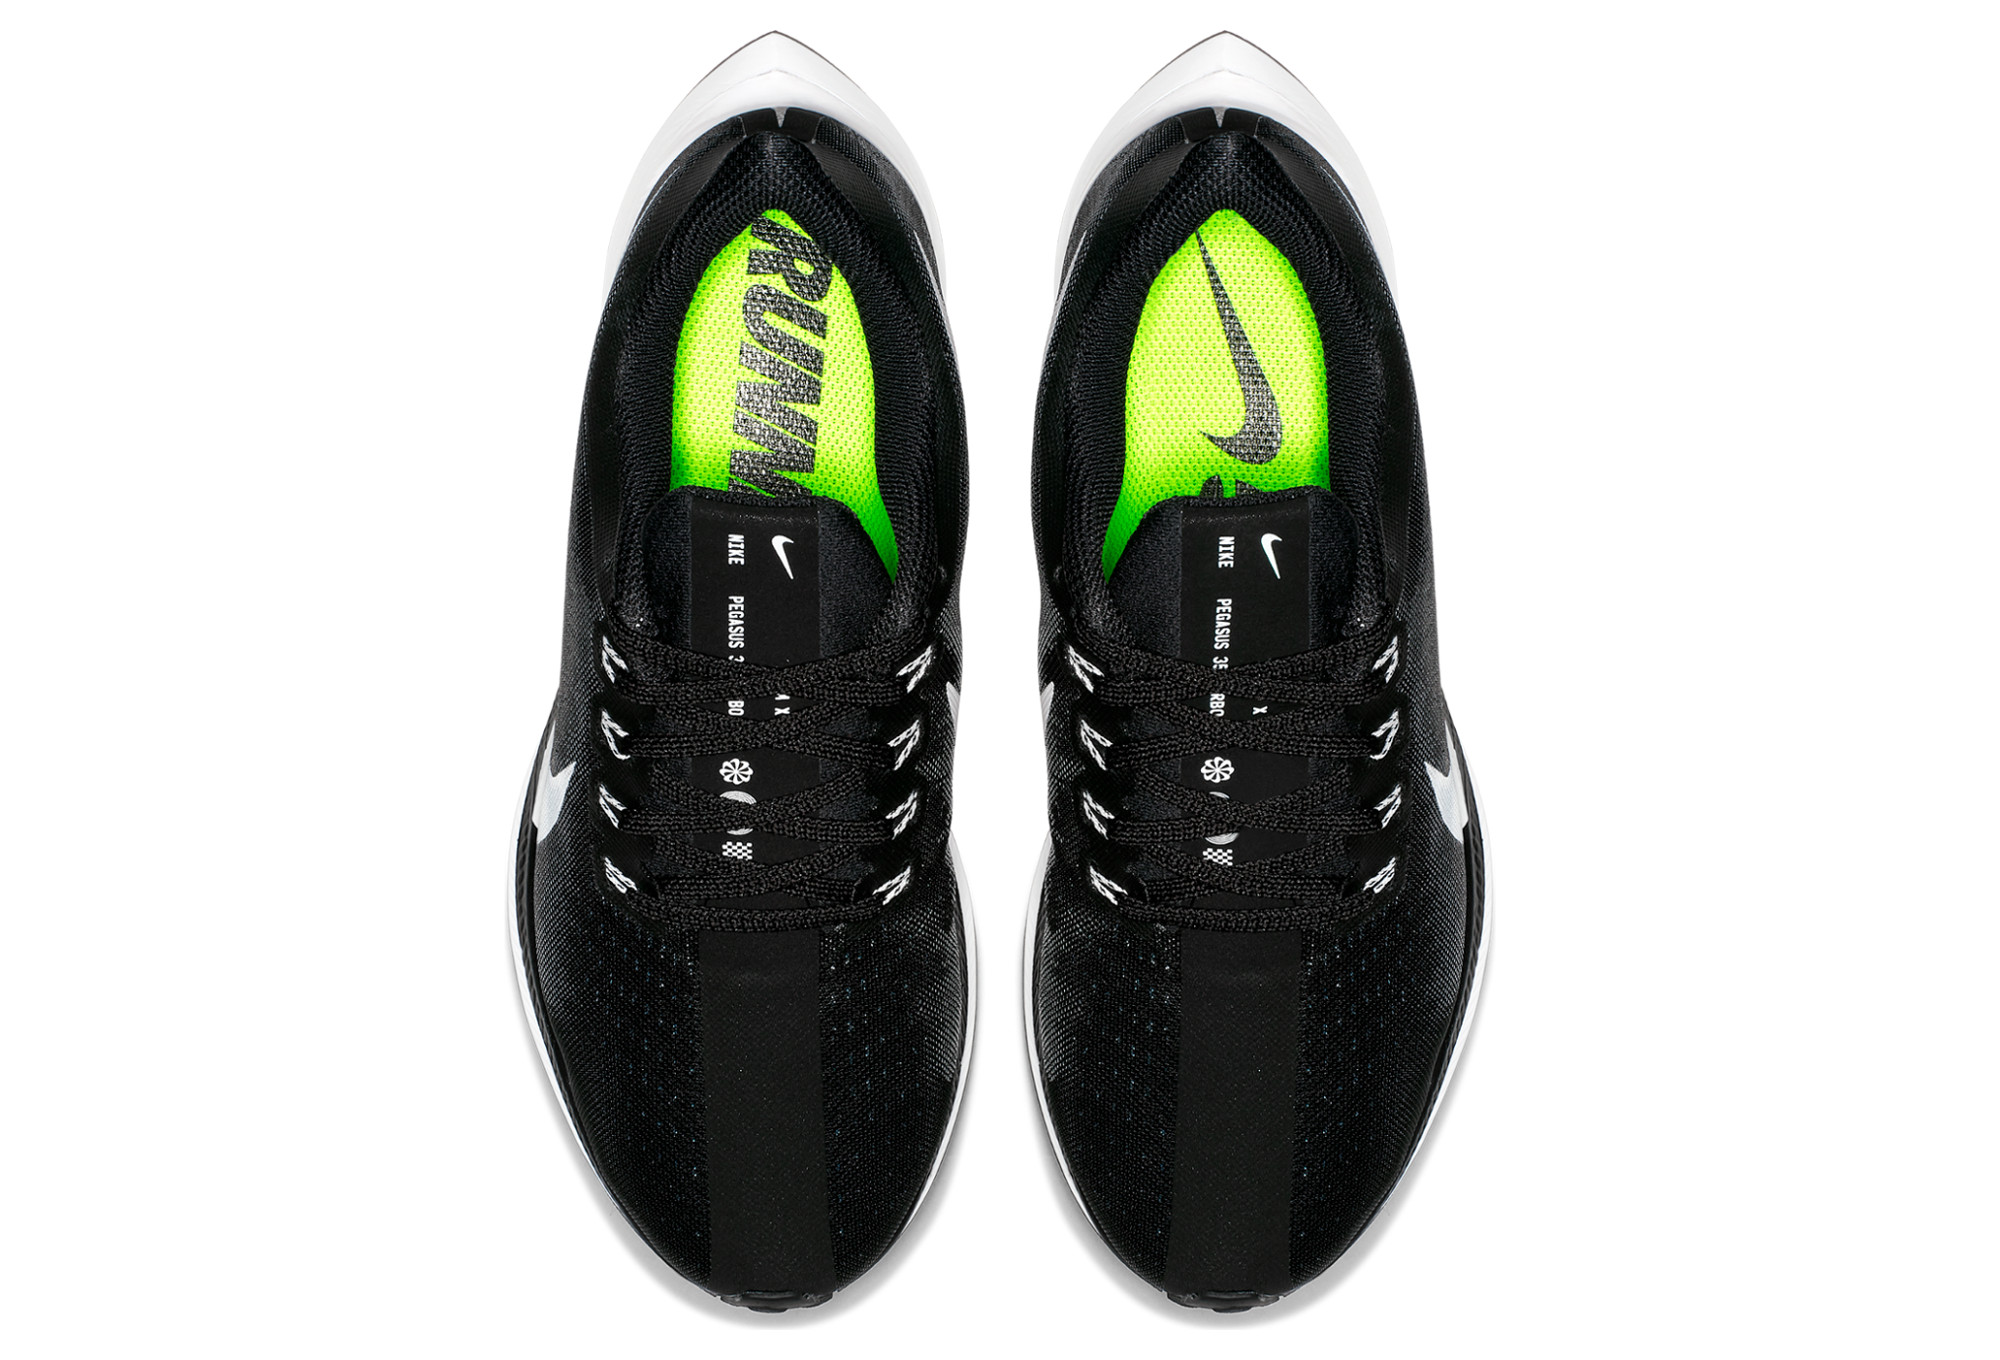 da07b49abf6e0 Chaussures de Running Femme Nike Zoom Pegasus Turbo Blanc   Noir ...